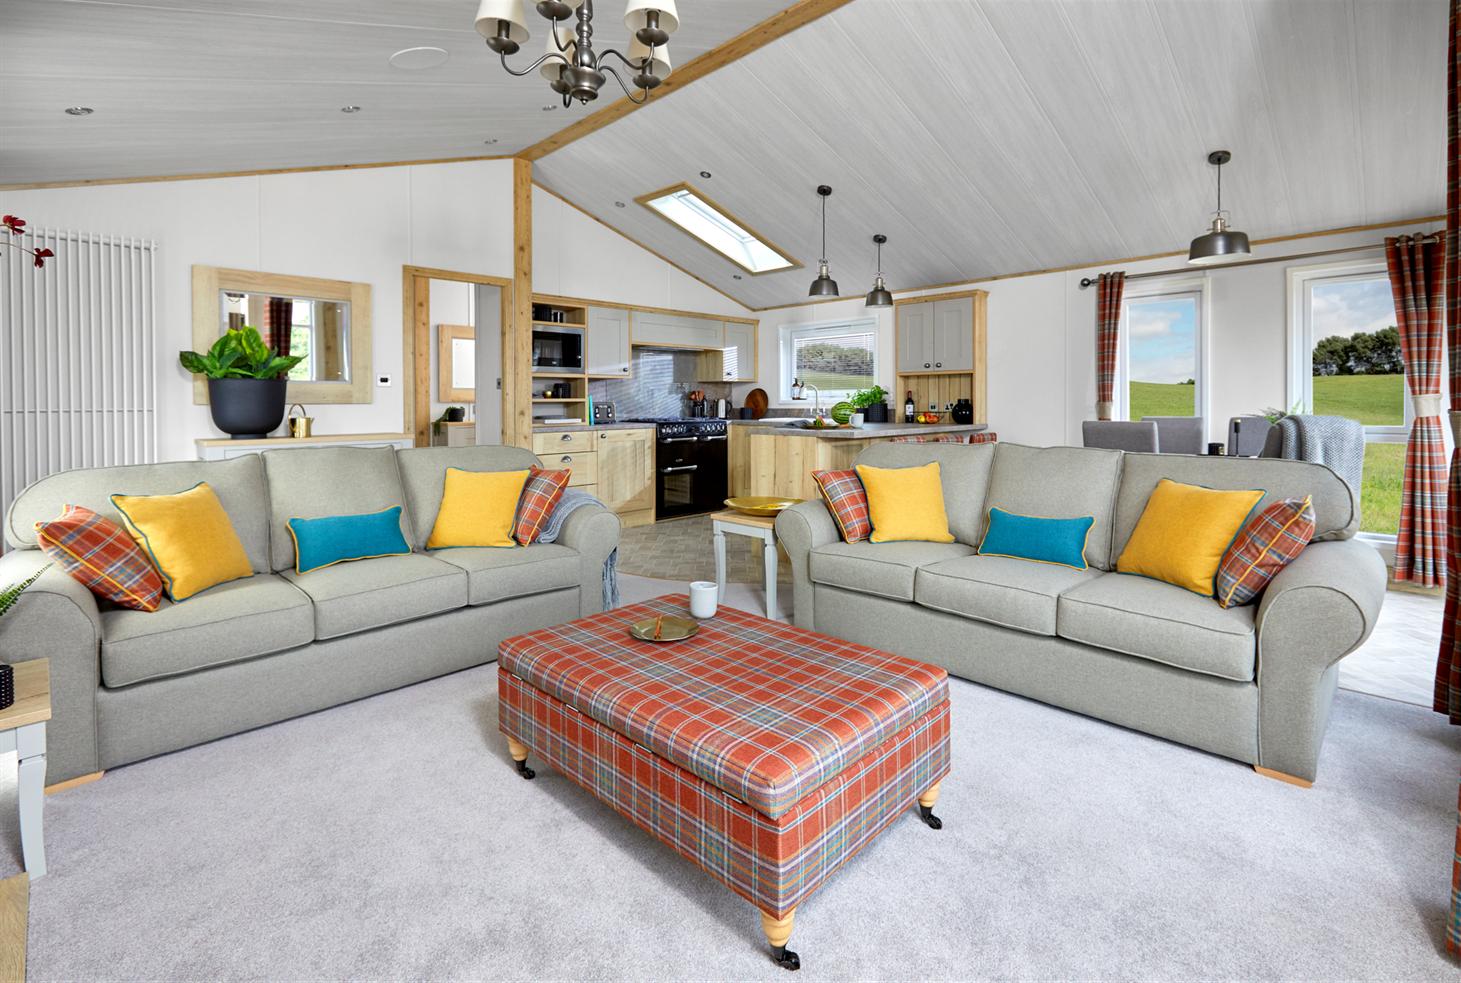 New 2021 ABI Harrogate Lodge 41ft x 20ft - 2 - lounge view